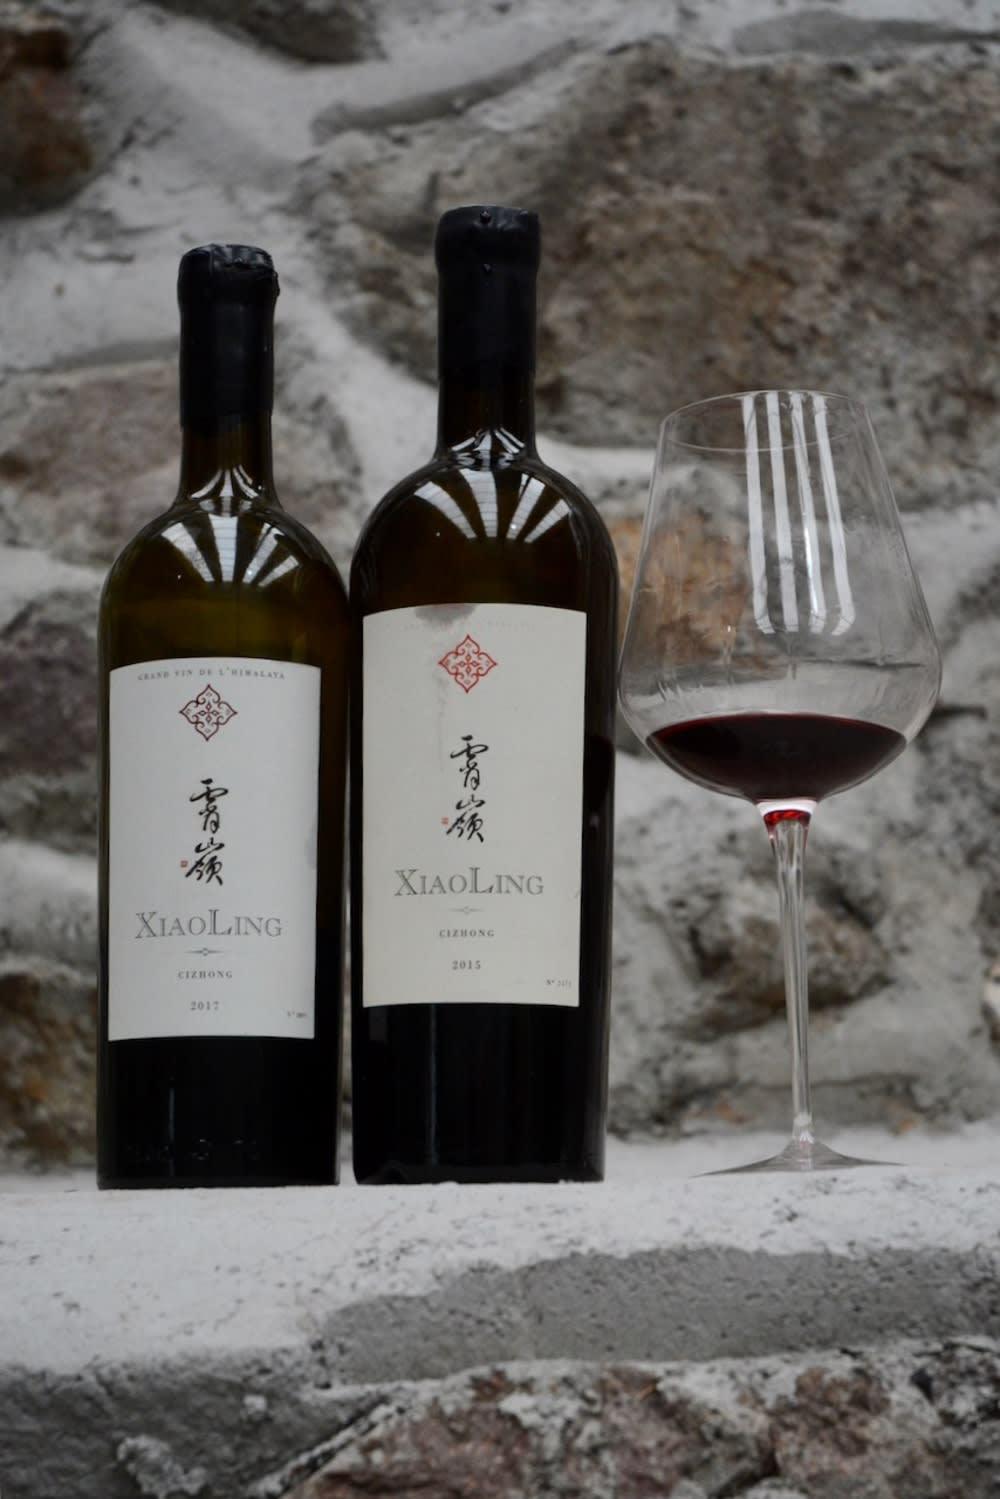 XiaoLing Estate wine